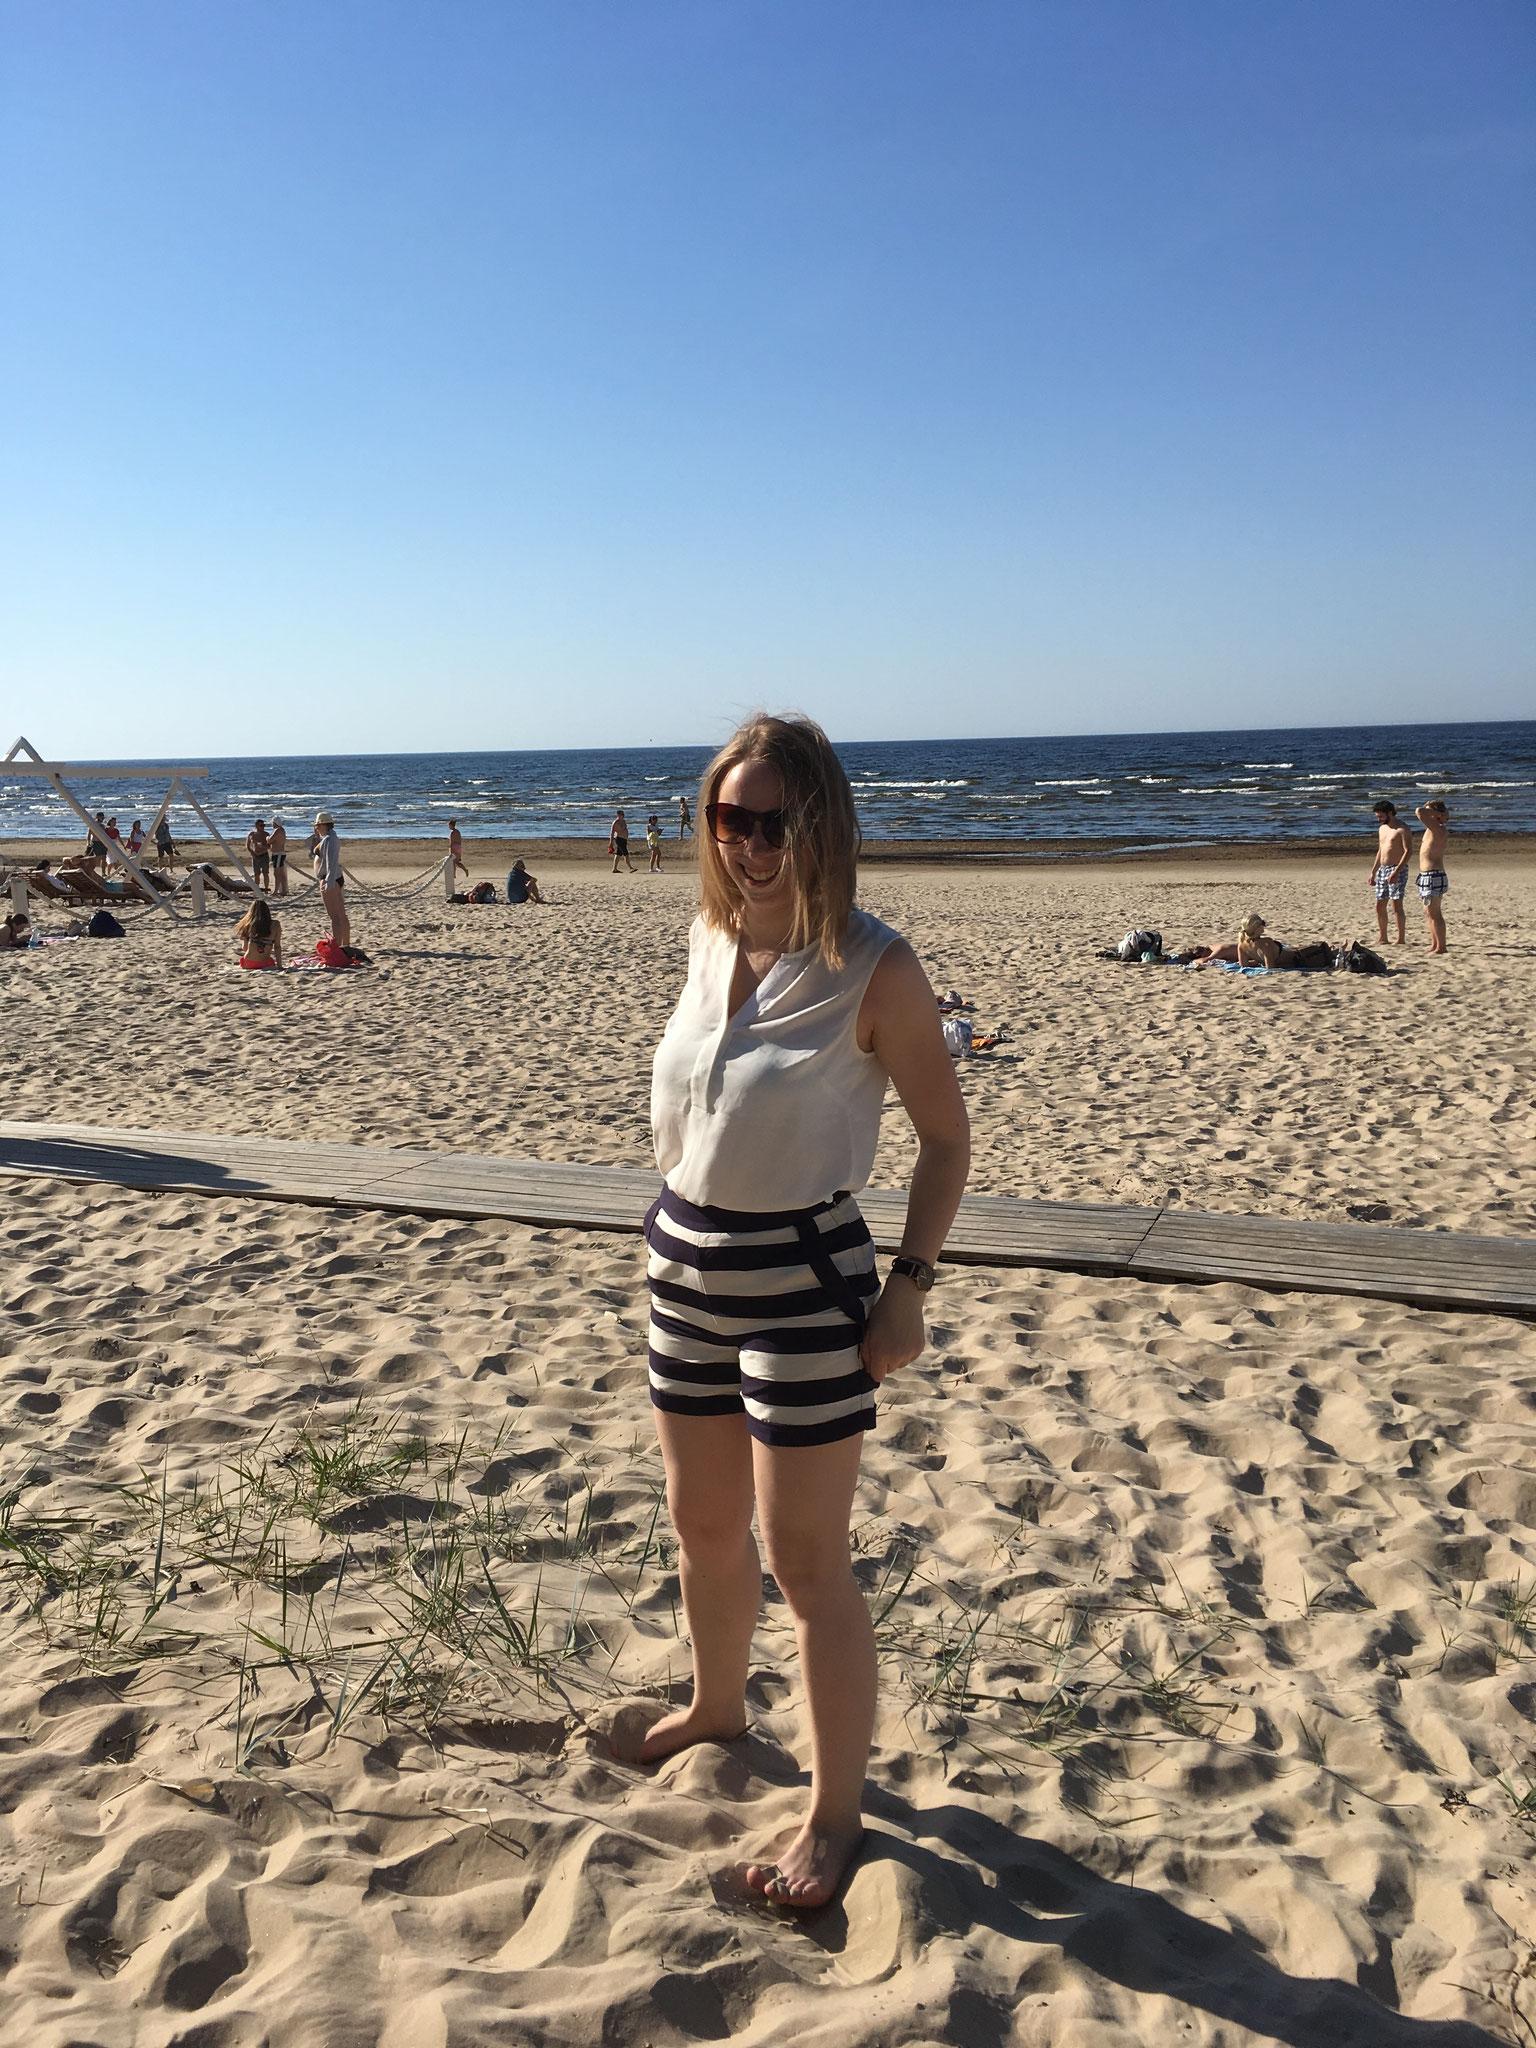 Josephine am Strand von Jumala